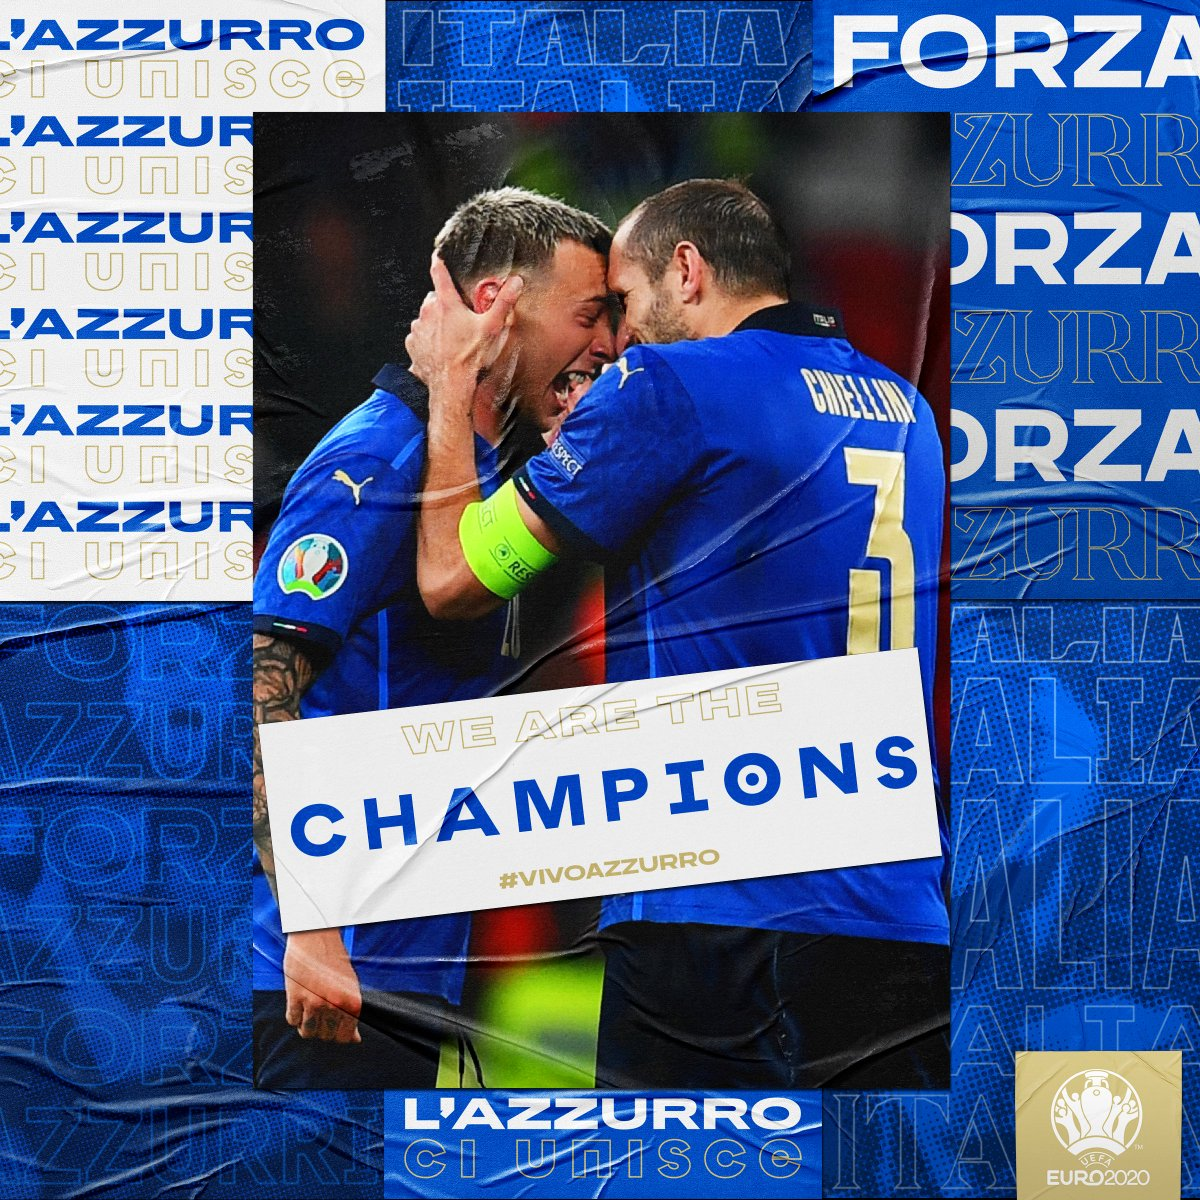 RT @azzurri : 𝐀𝐑𝐄 𝐀𝐑𝐄 𝐄𝐔𝐑𝐎𝐏𝐄𝐀𝐍 𝐂𝐇𝐀𝐌𝐏𝐈𝐎𝐍𝐒!!! 🤩 #VivoAzzurro #EURO2020 #ITA #ITAENG https://t.co/sj2020ycqnBI2020